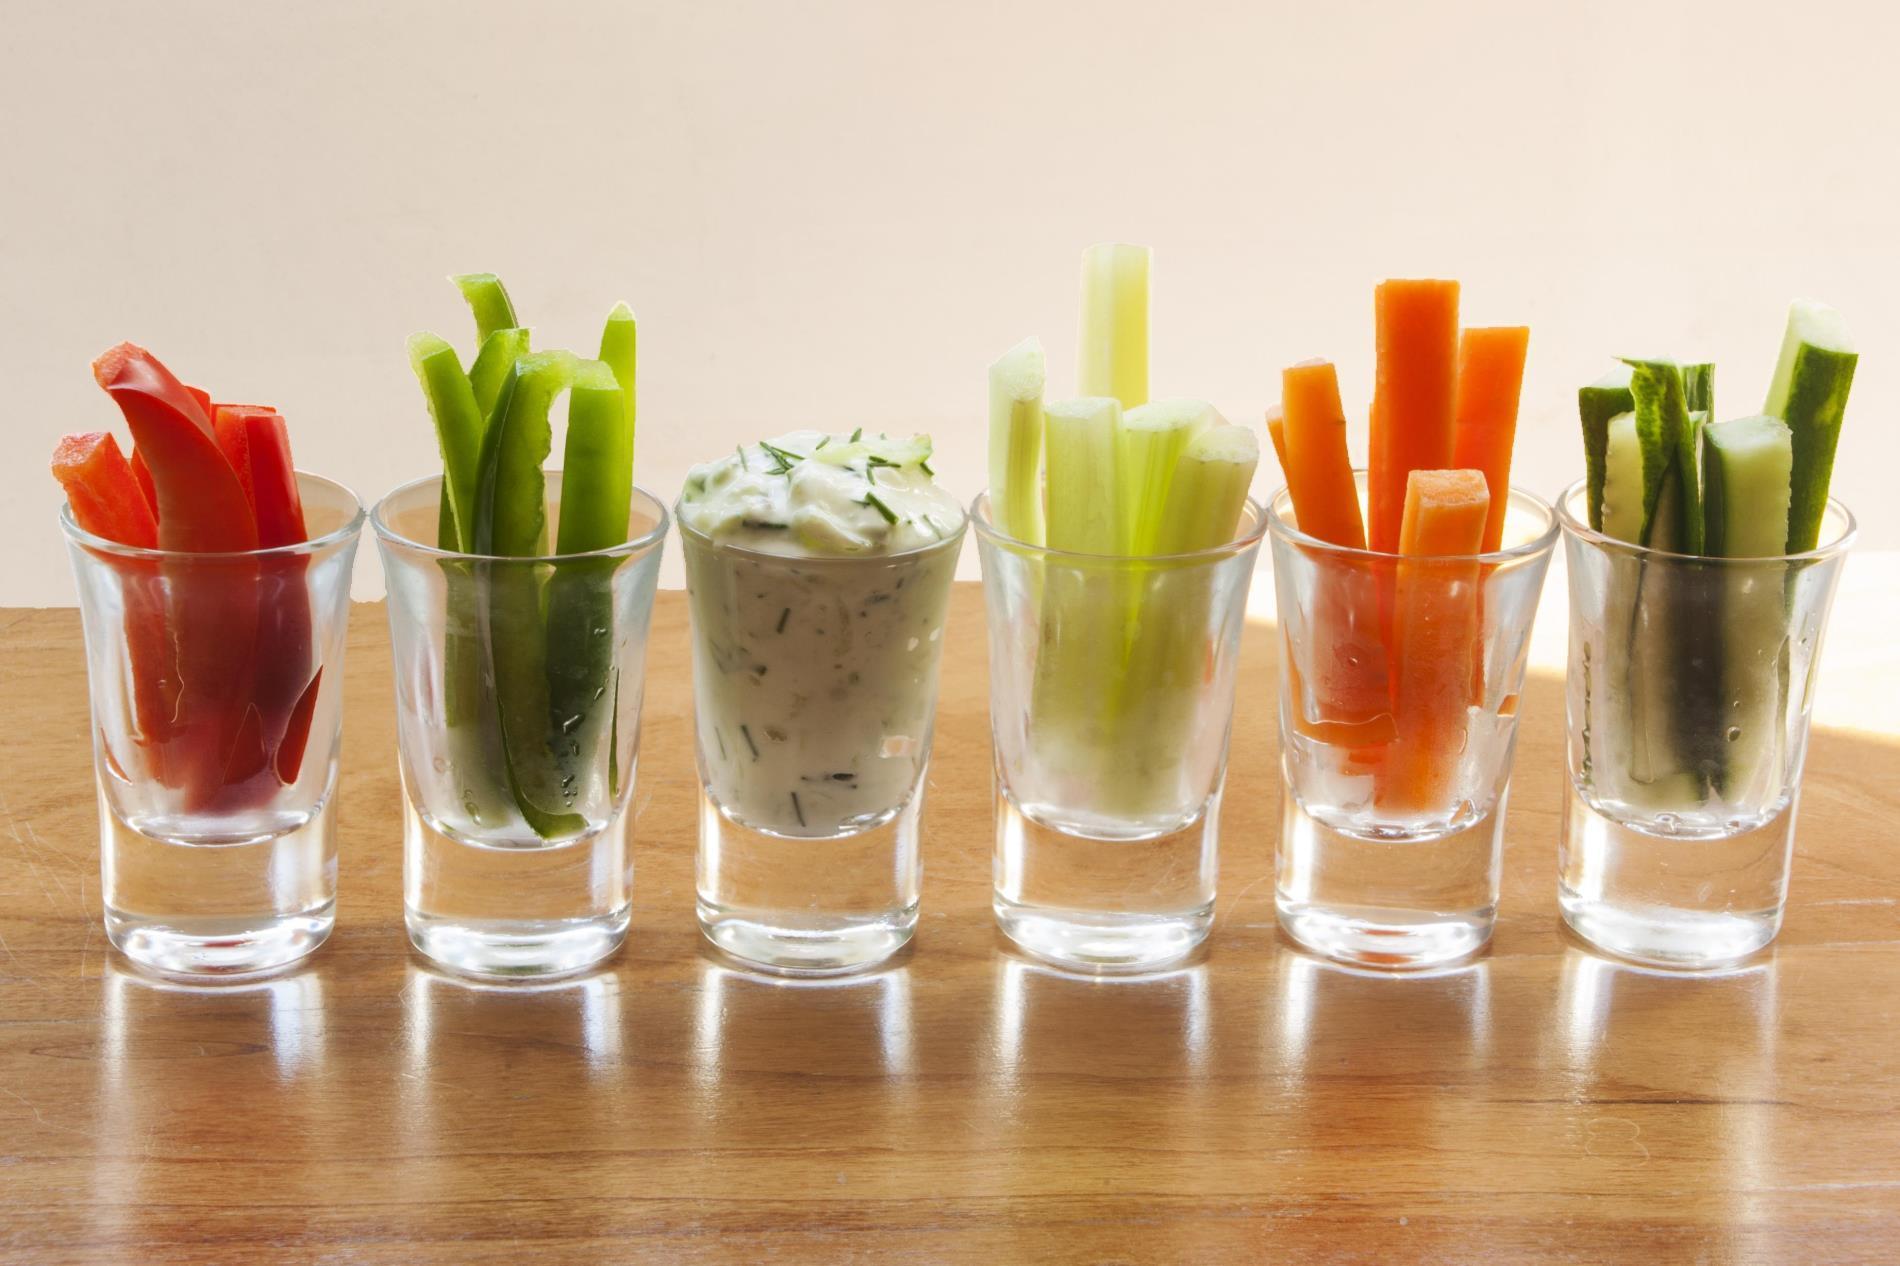 Aeres MBO Food groentedip gezond